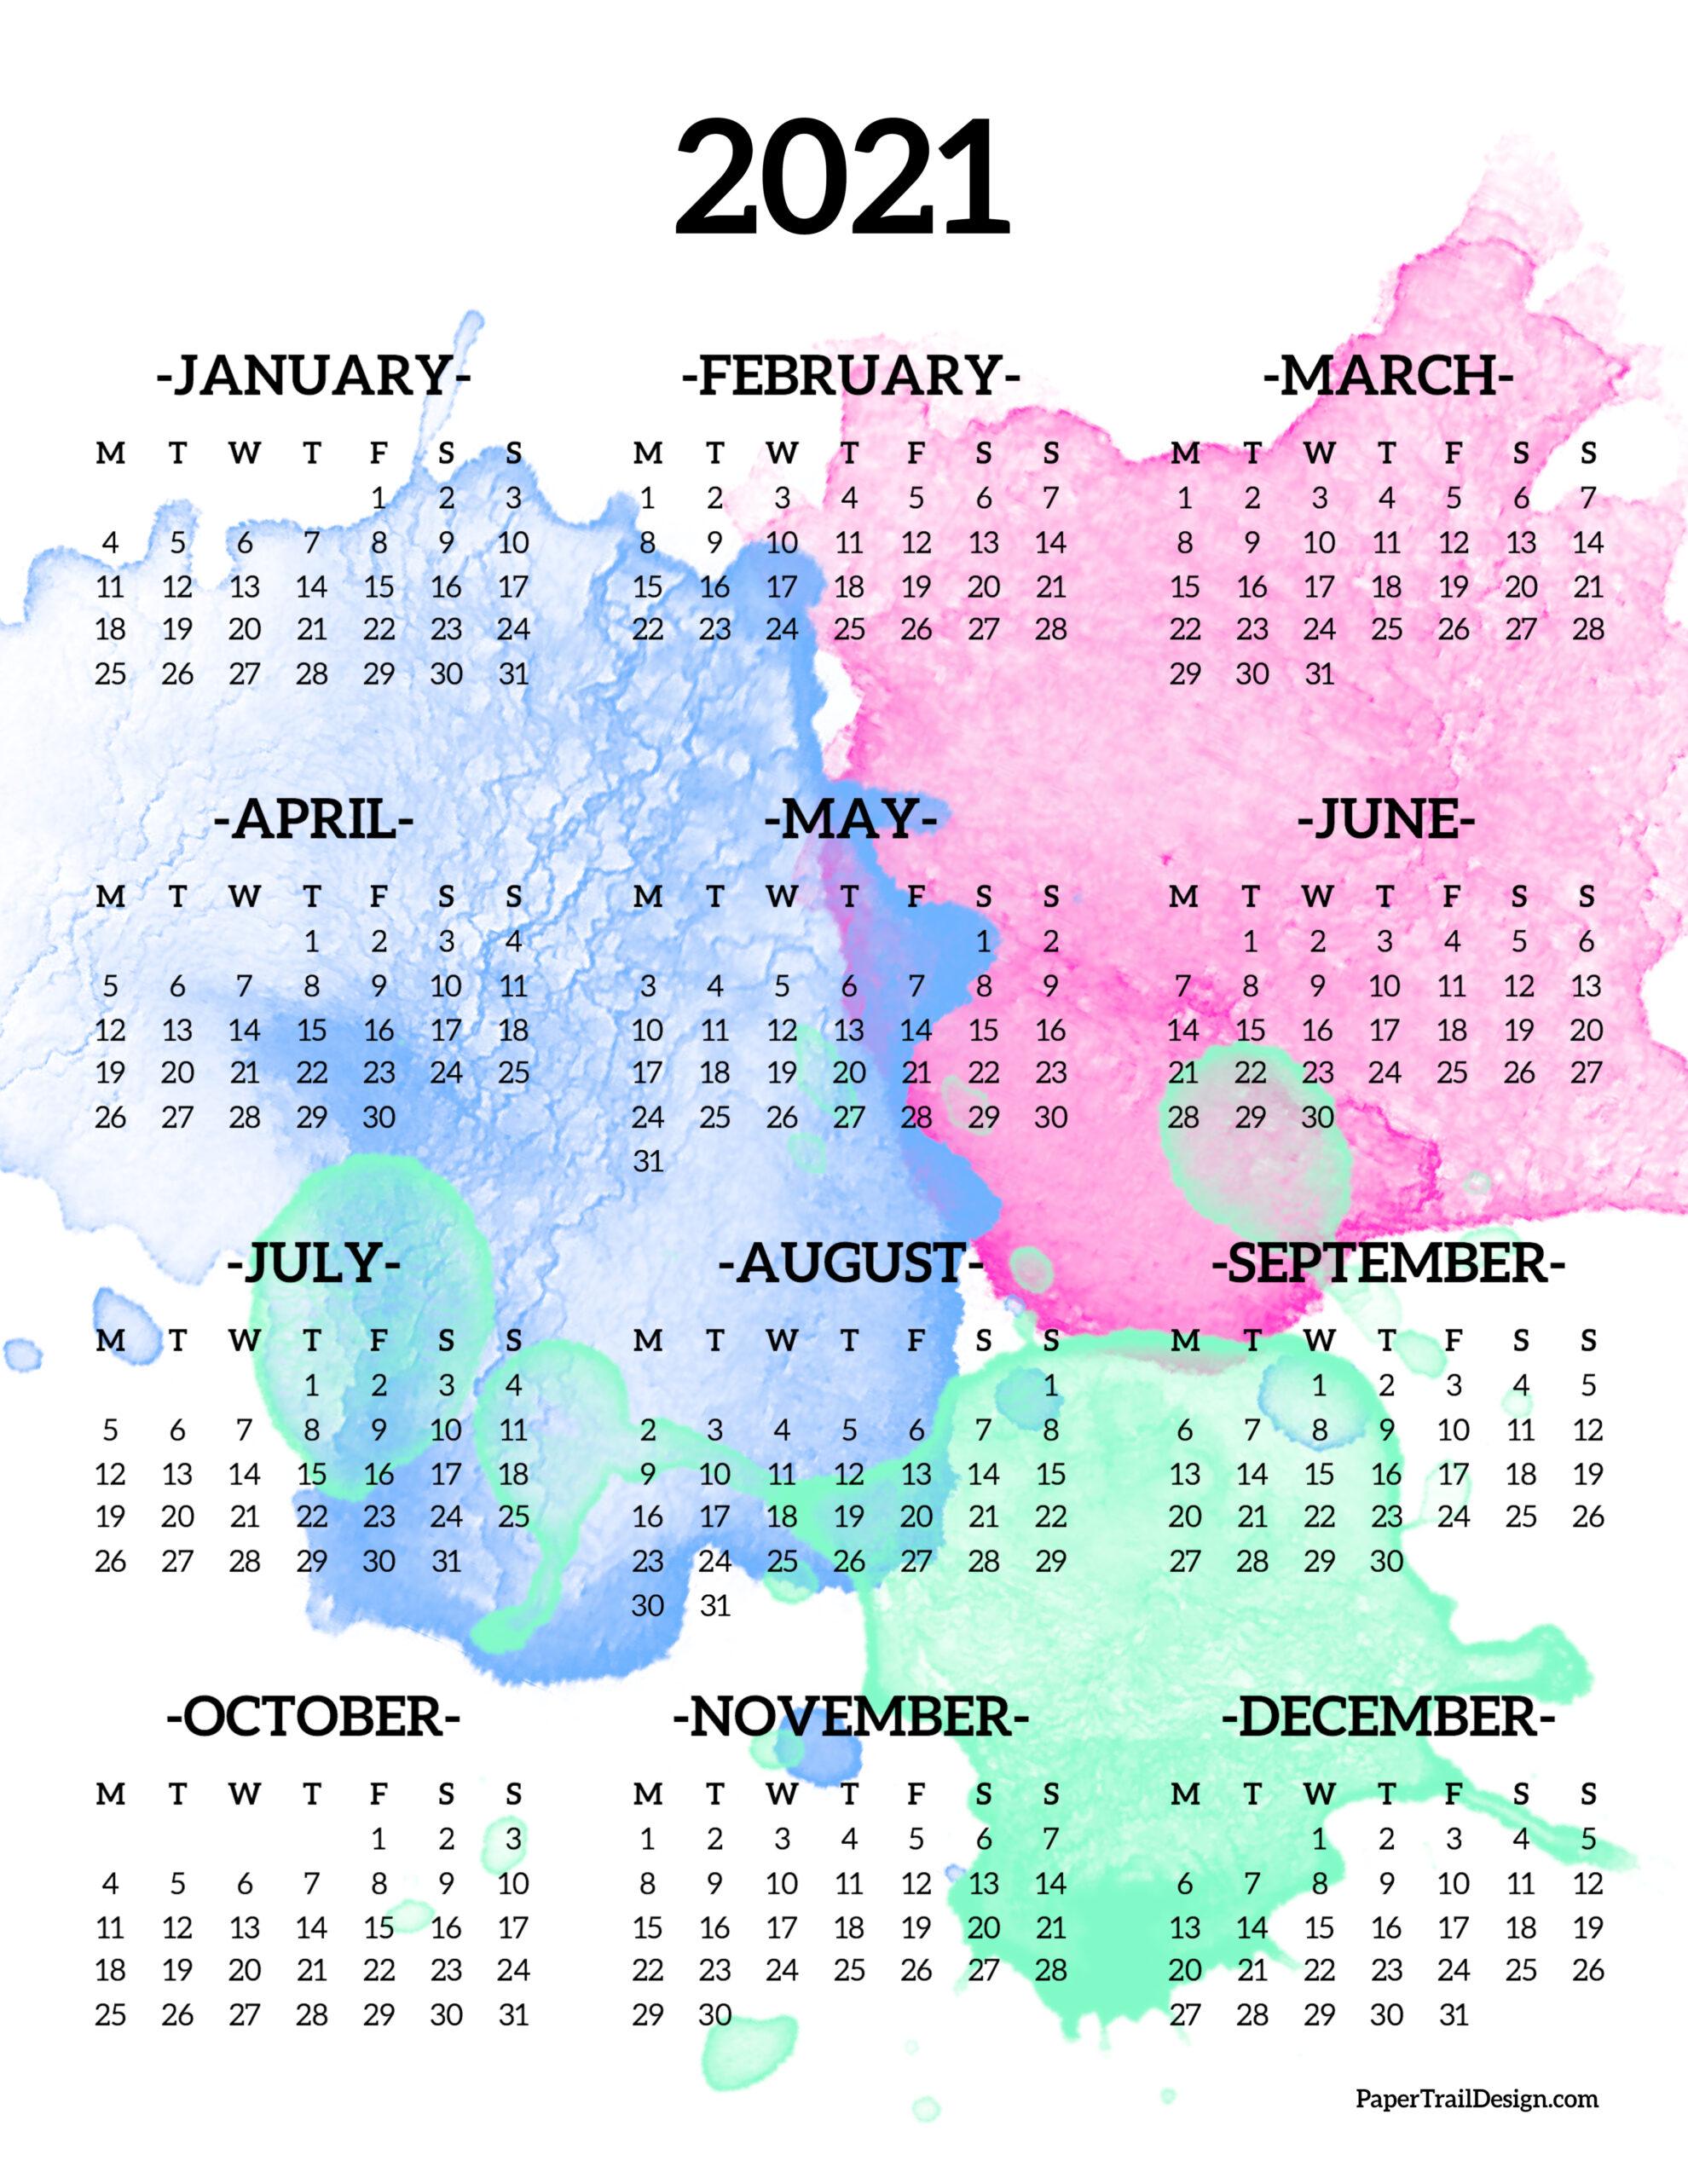 2021 One Page Calendar - Monday Start | Paper Trail Design